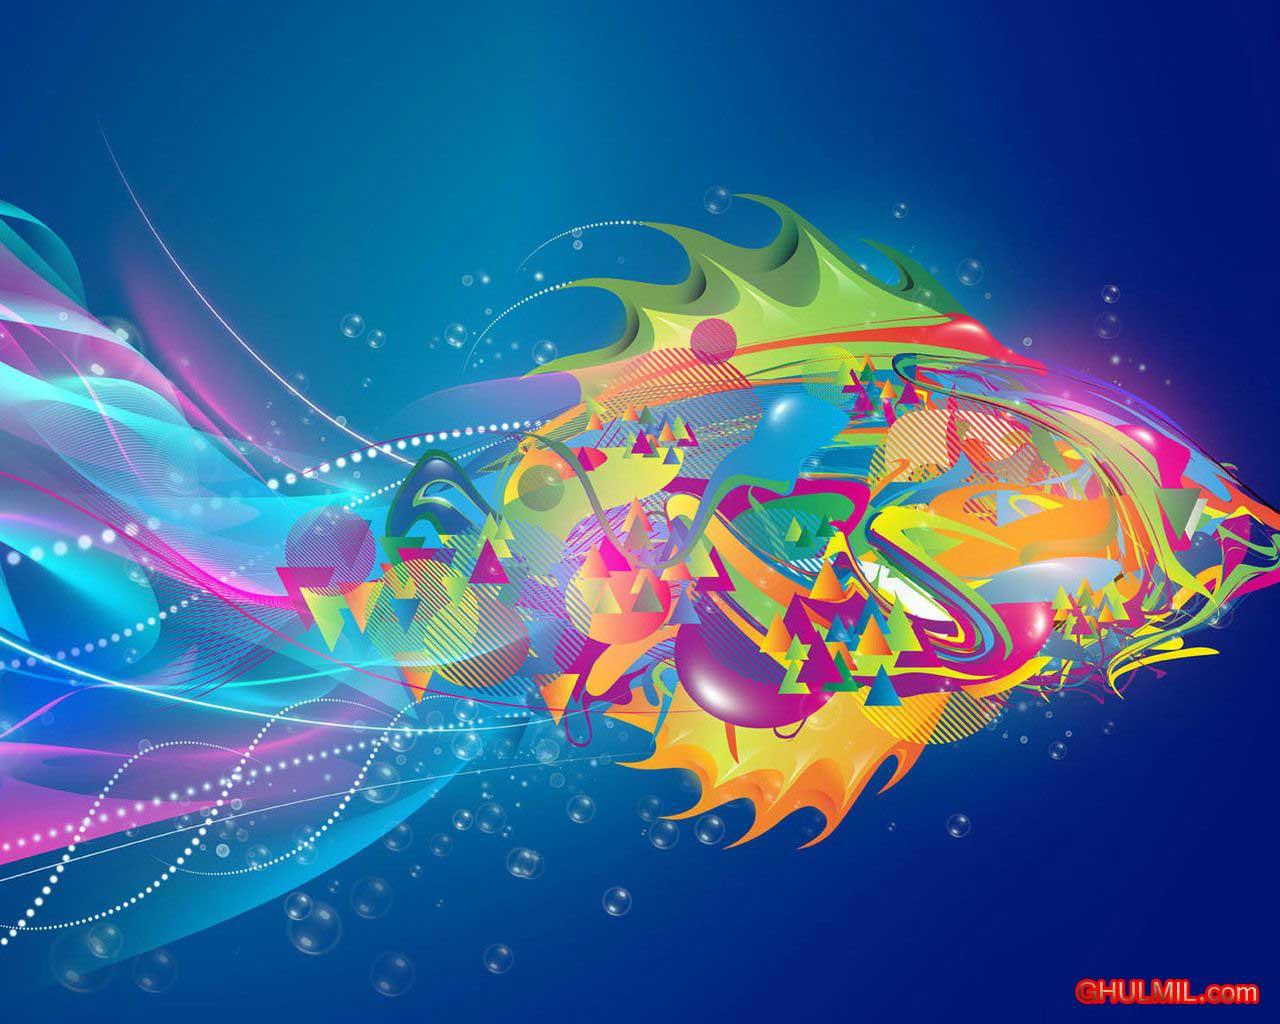 Wallpapers For Desktop Laptop Background HD Wallpapers 1280x1024